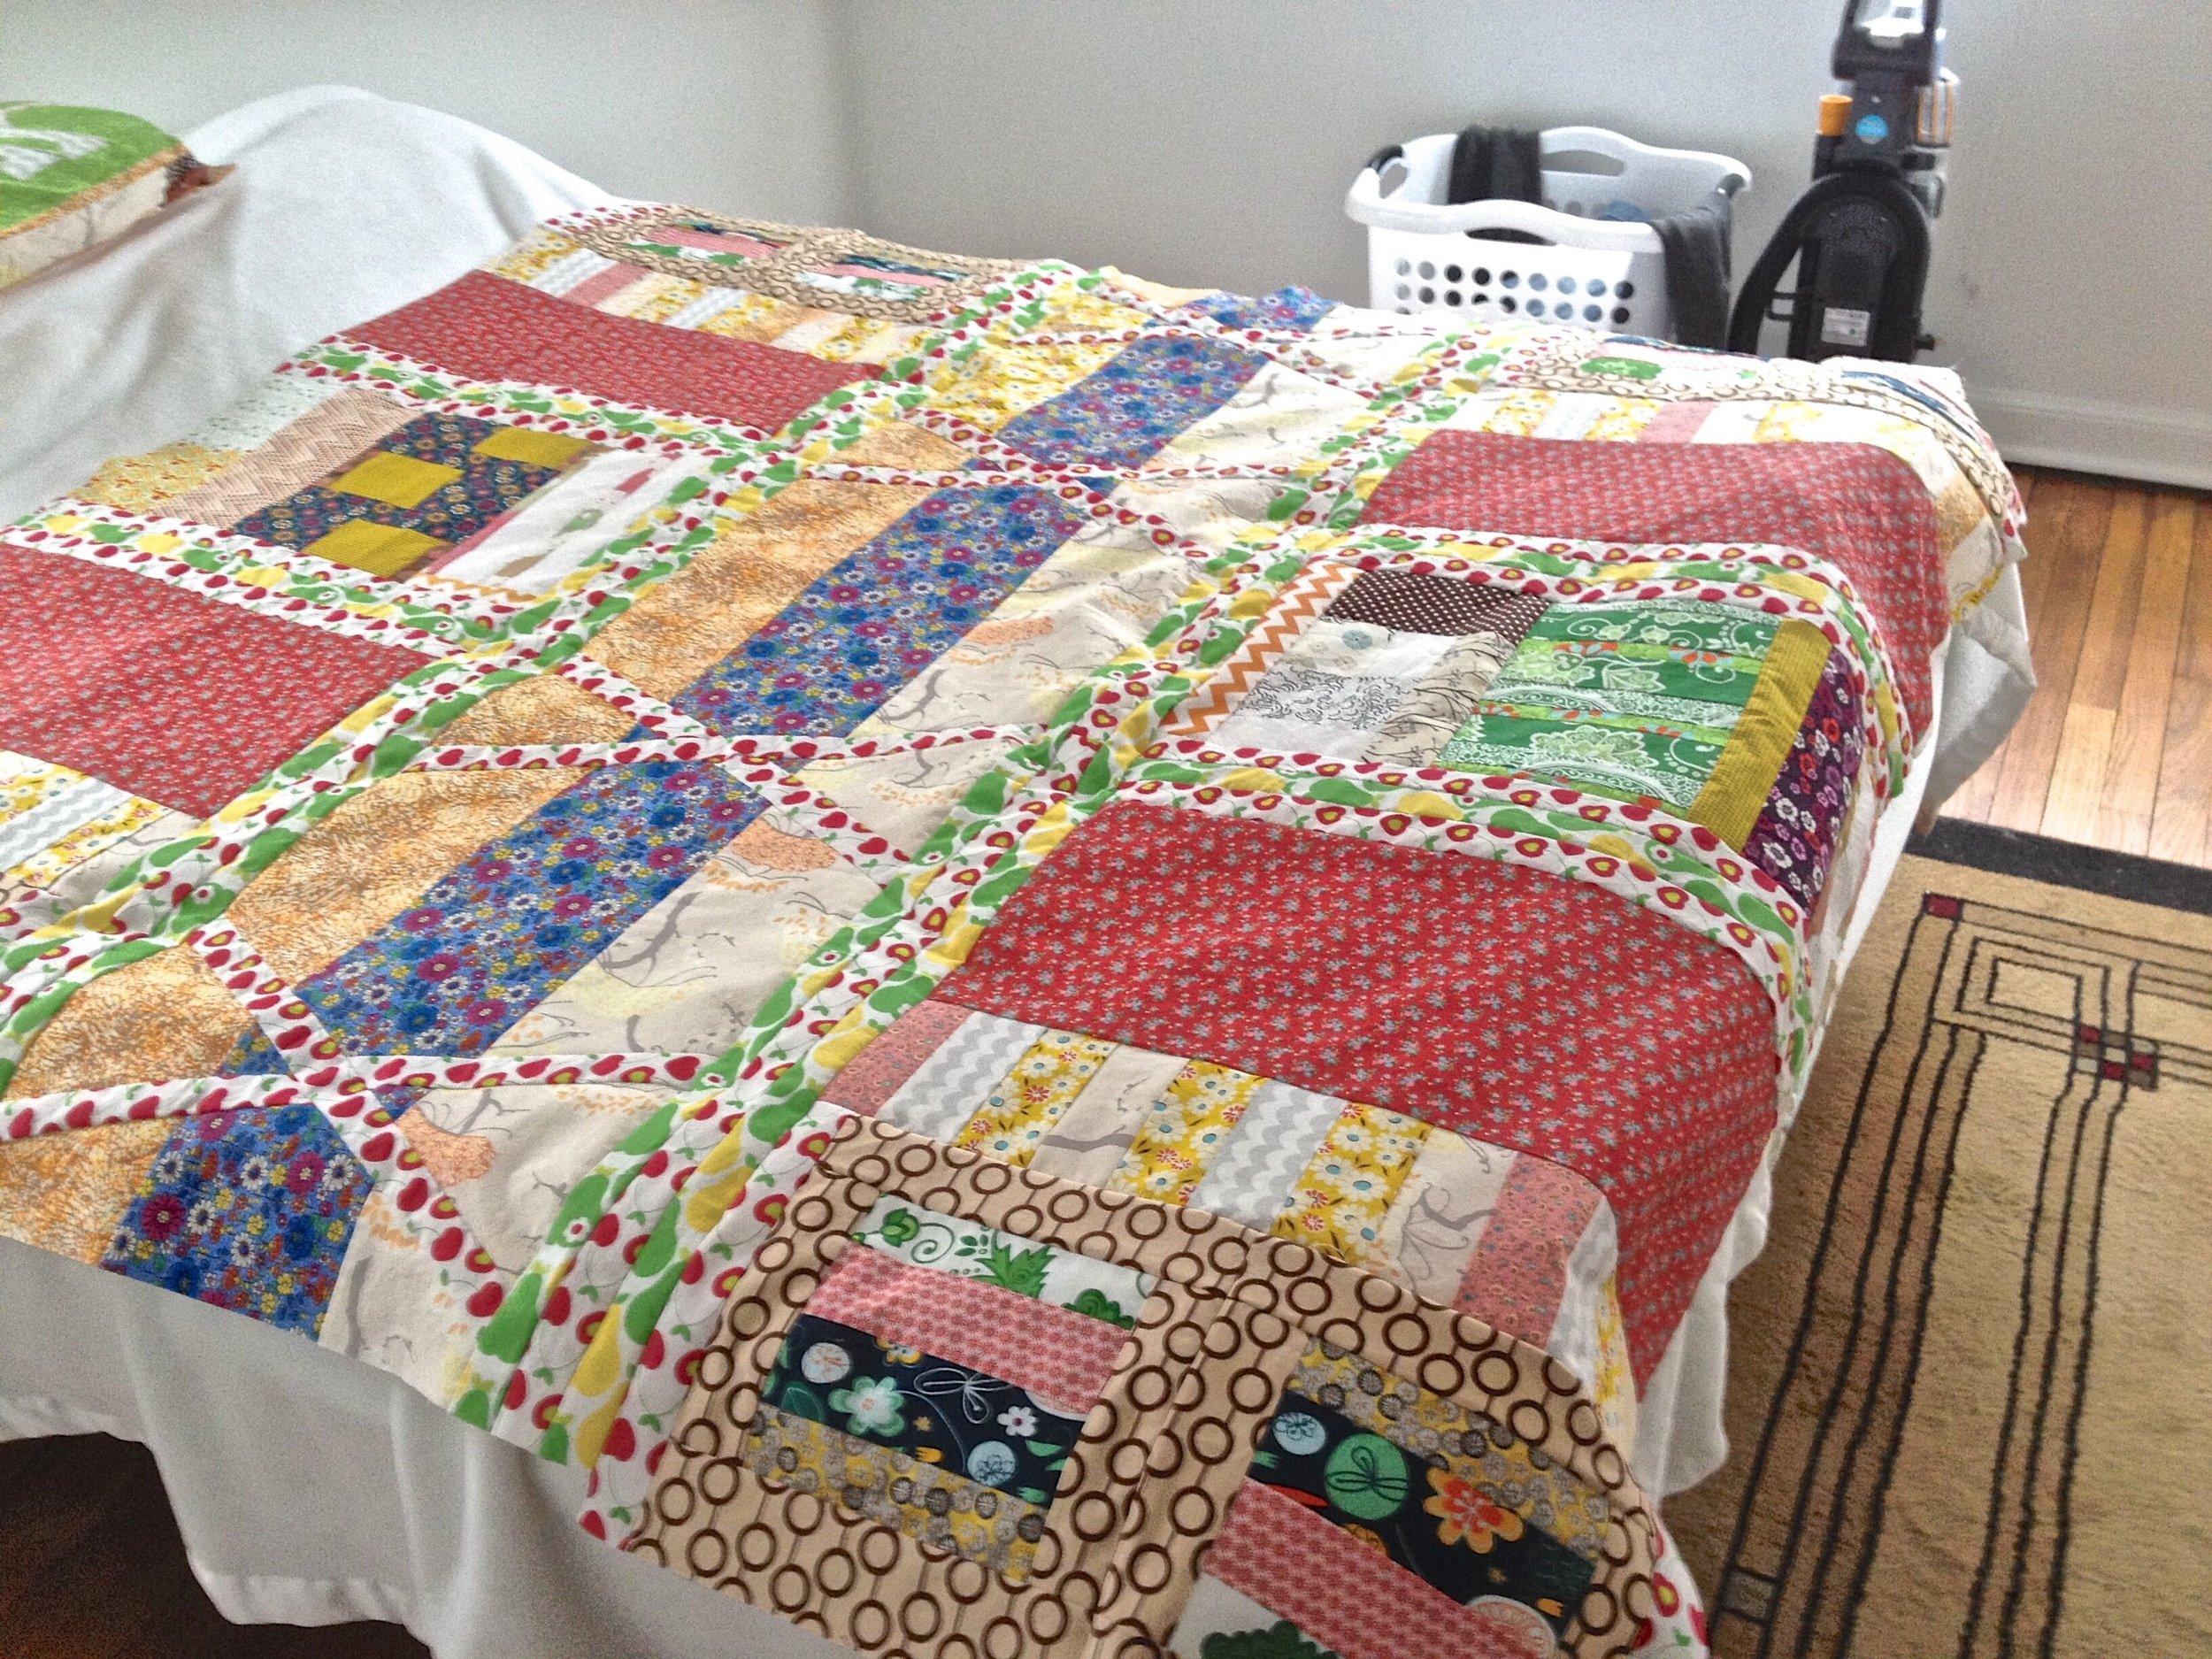 English Garden Quilt by Kathryn Sturges